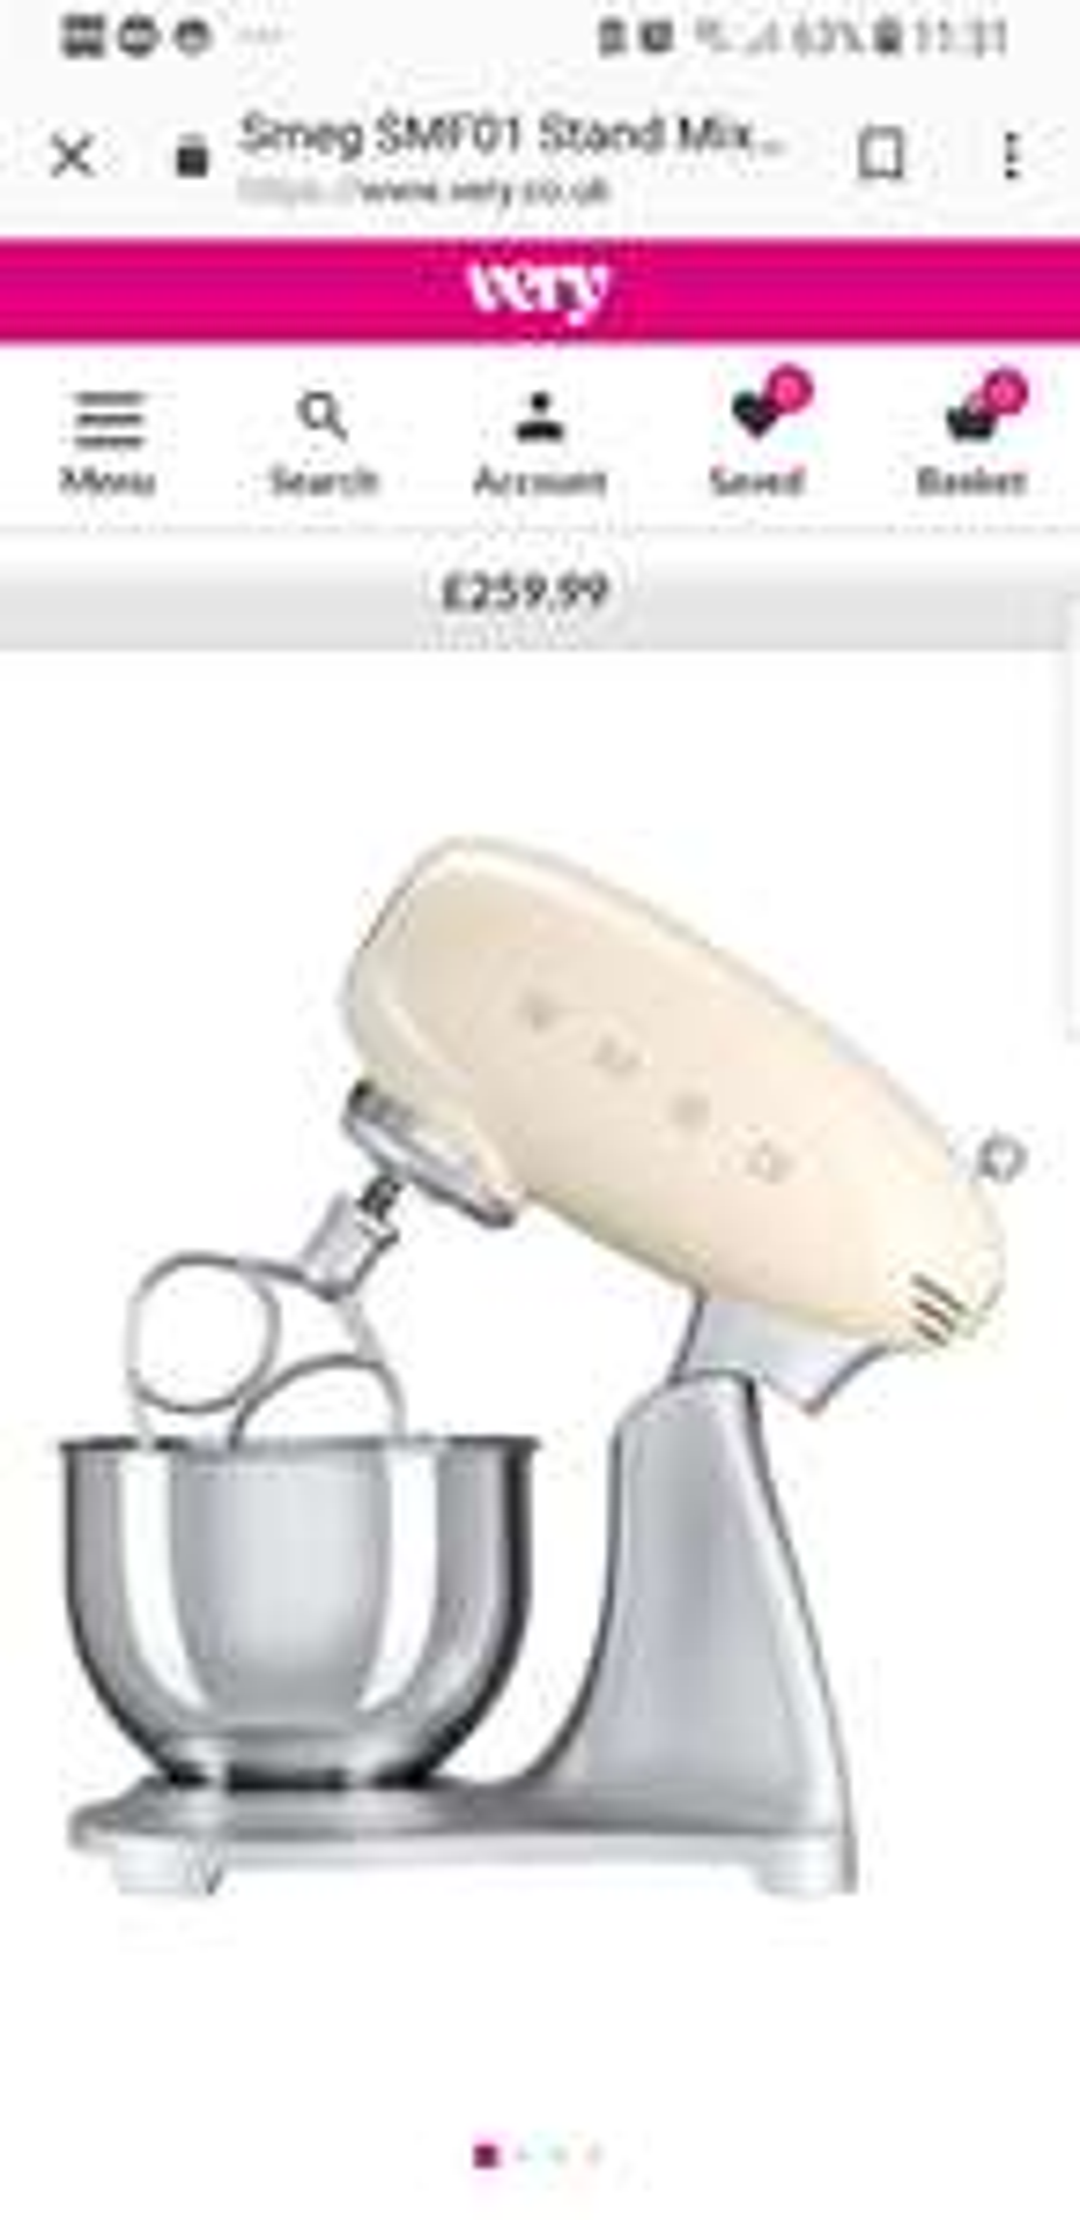 Smeg Mixer at Very for £259.99